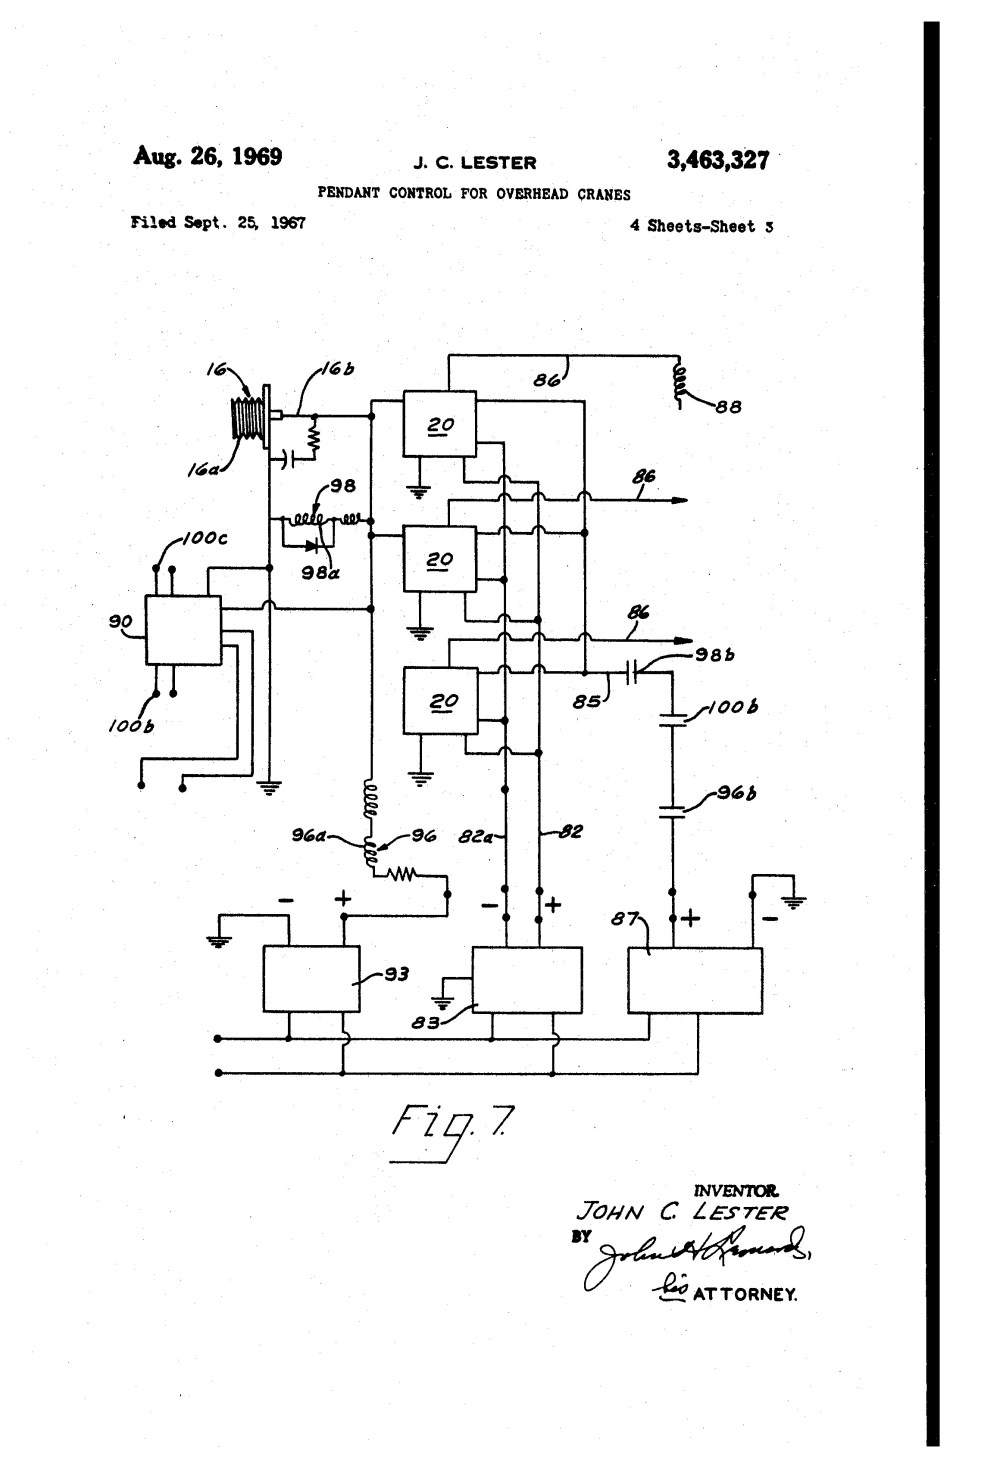 medium resolution of pendent control wiring diagram cm wiring diagram for you cm wiring diagram schematic